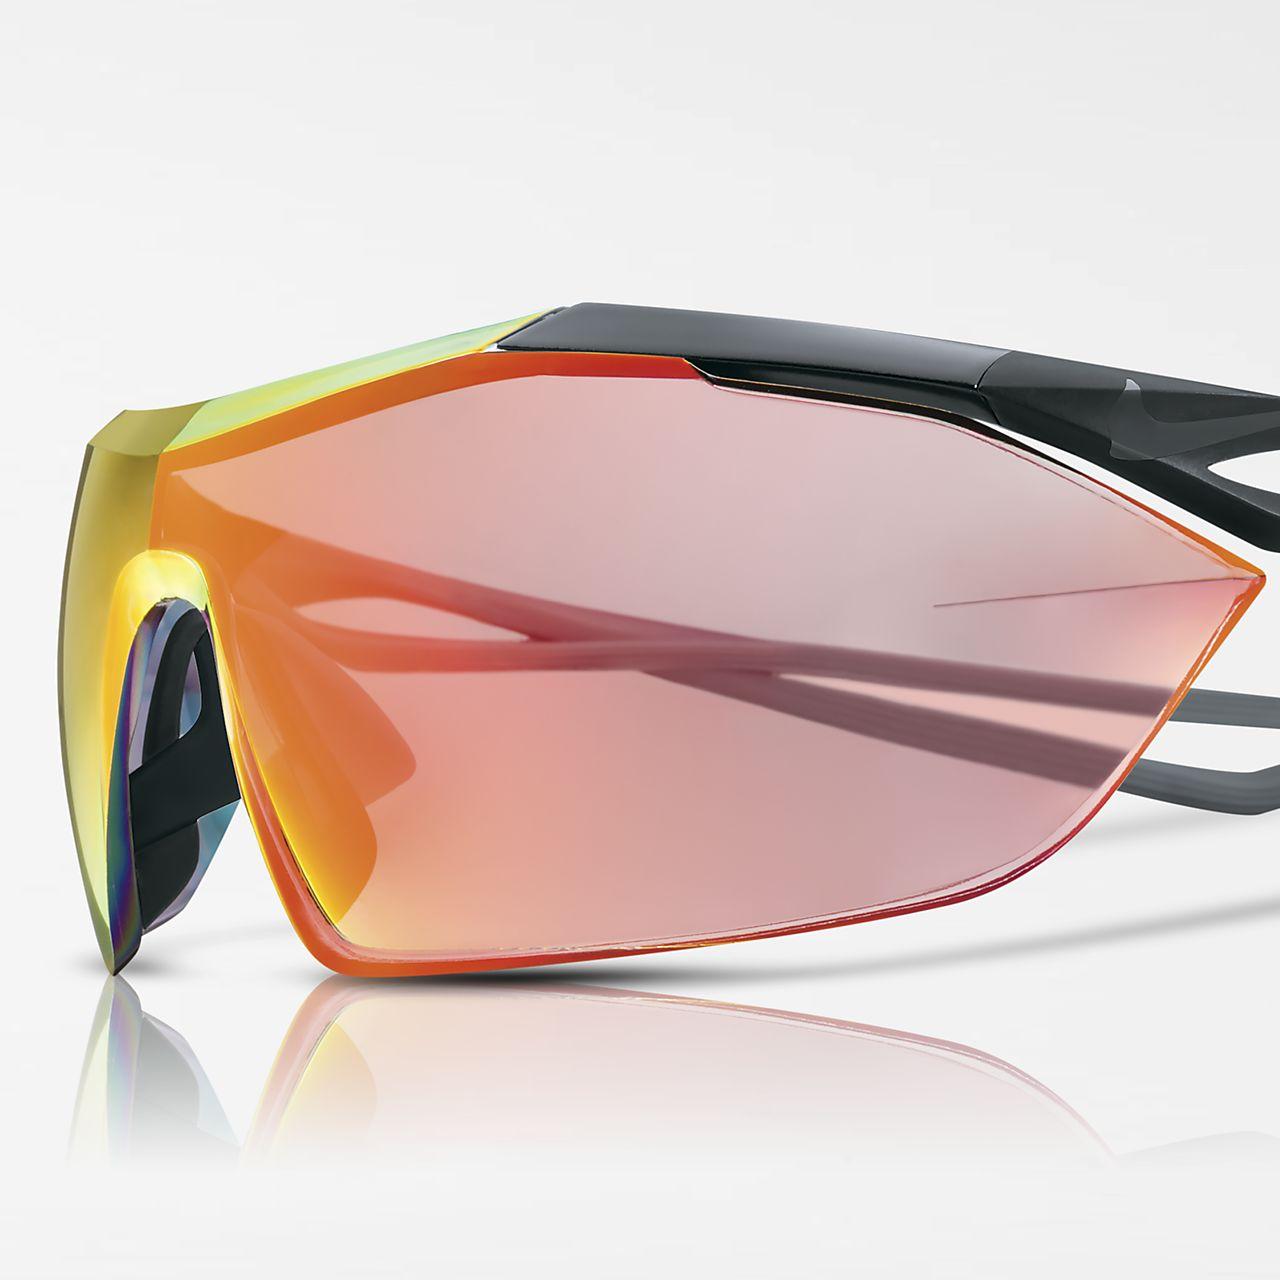 ca712df261 Nike Vaporwing Elite R Sunglasses. Nike.com